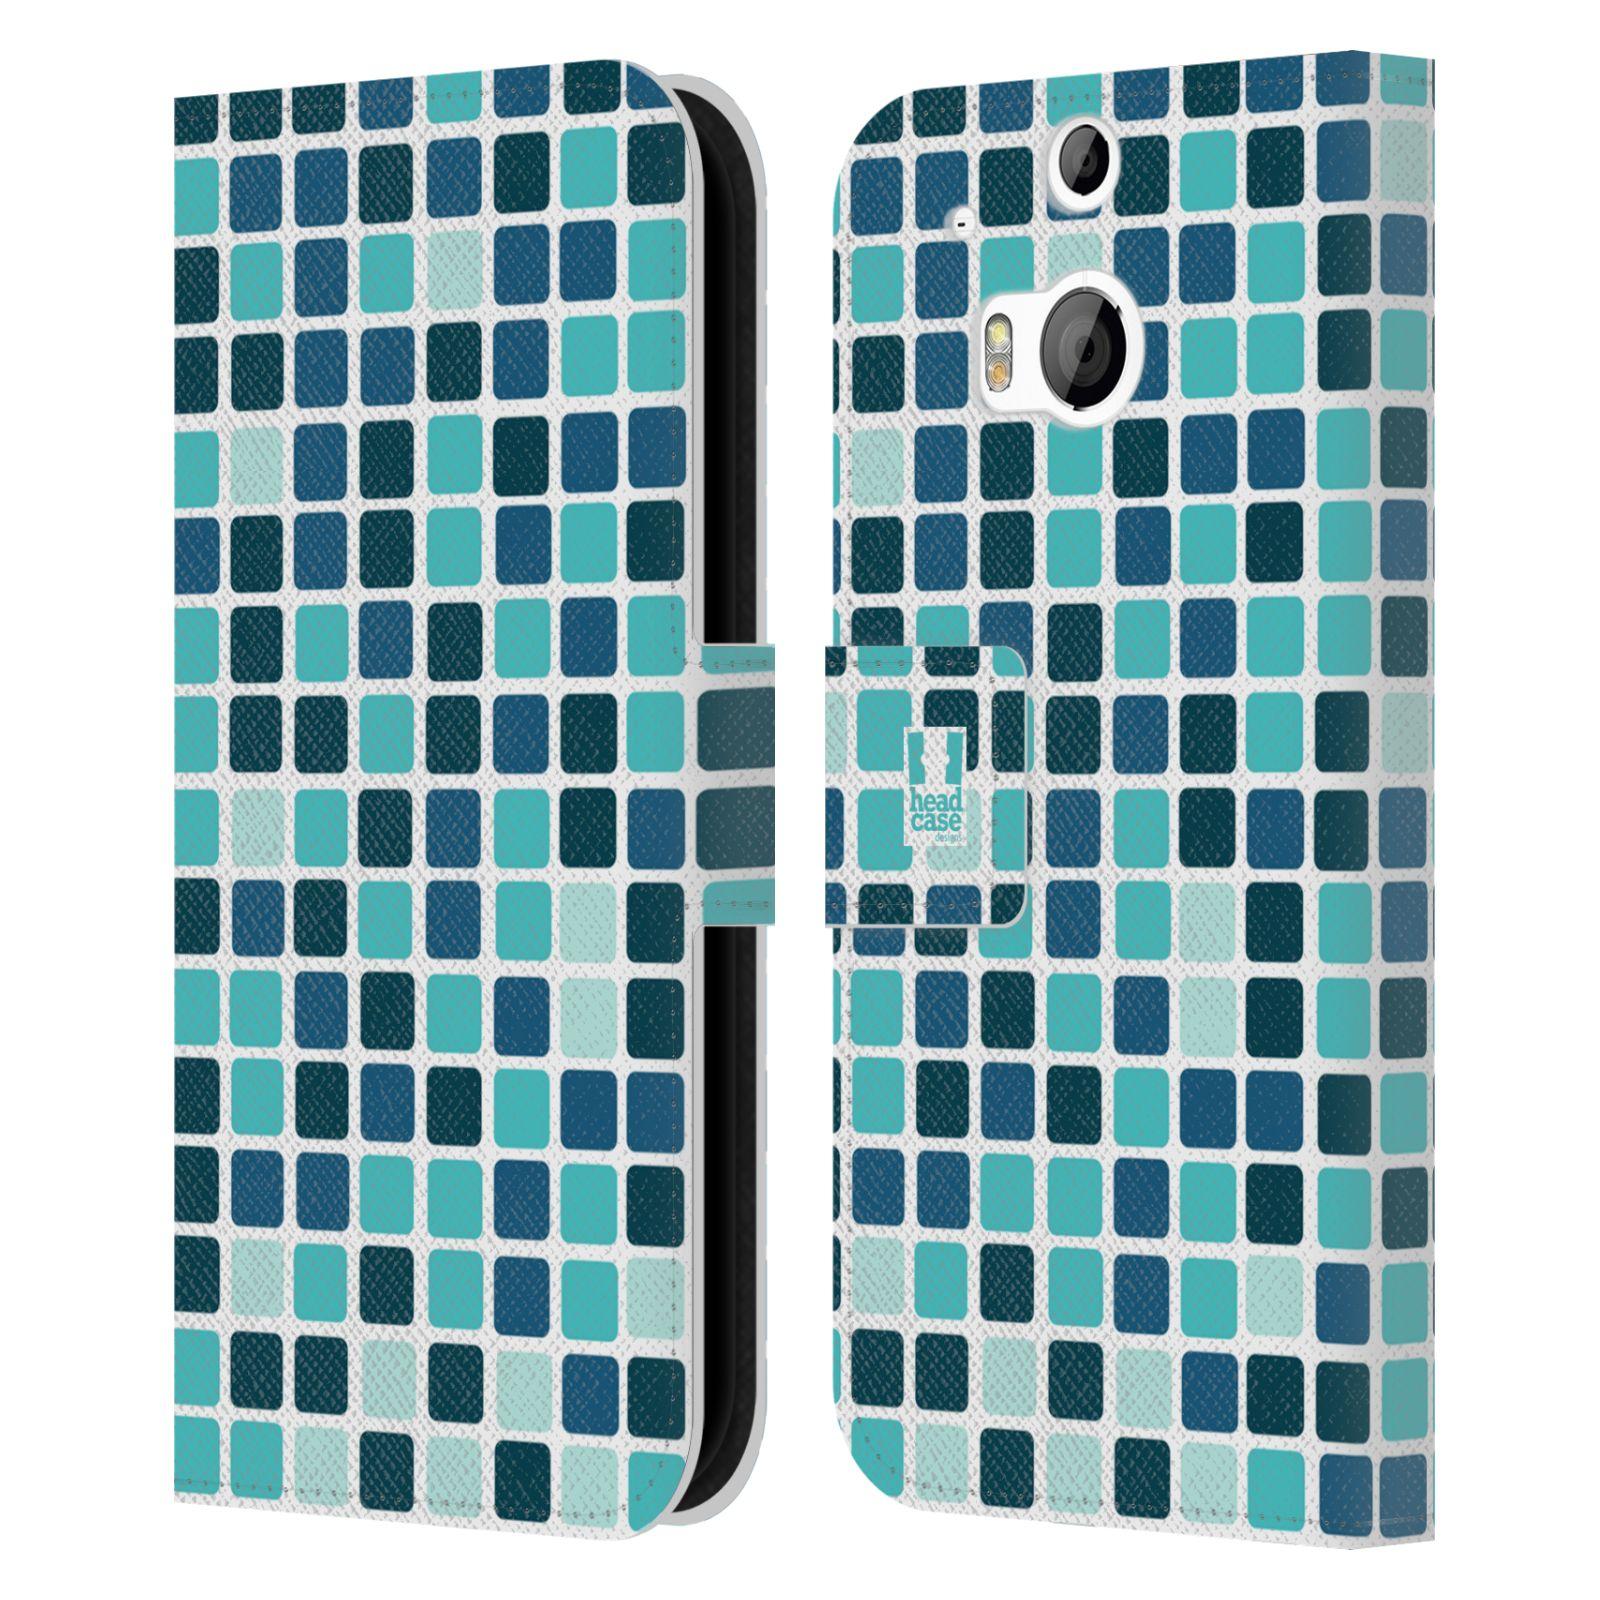 HEAD CASE Flipové pouzdro pro mobil HTC ONE (M8, M8s) DISKO kostičky modrá